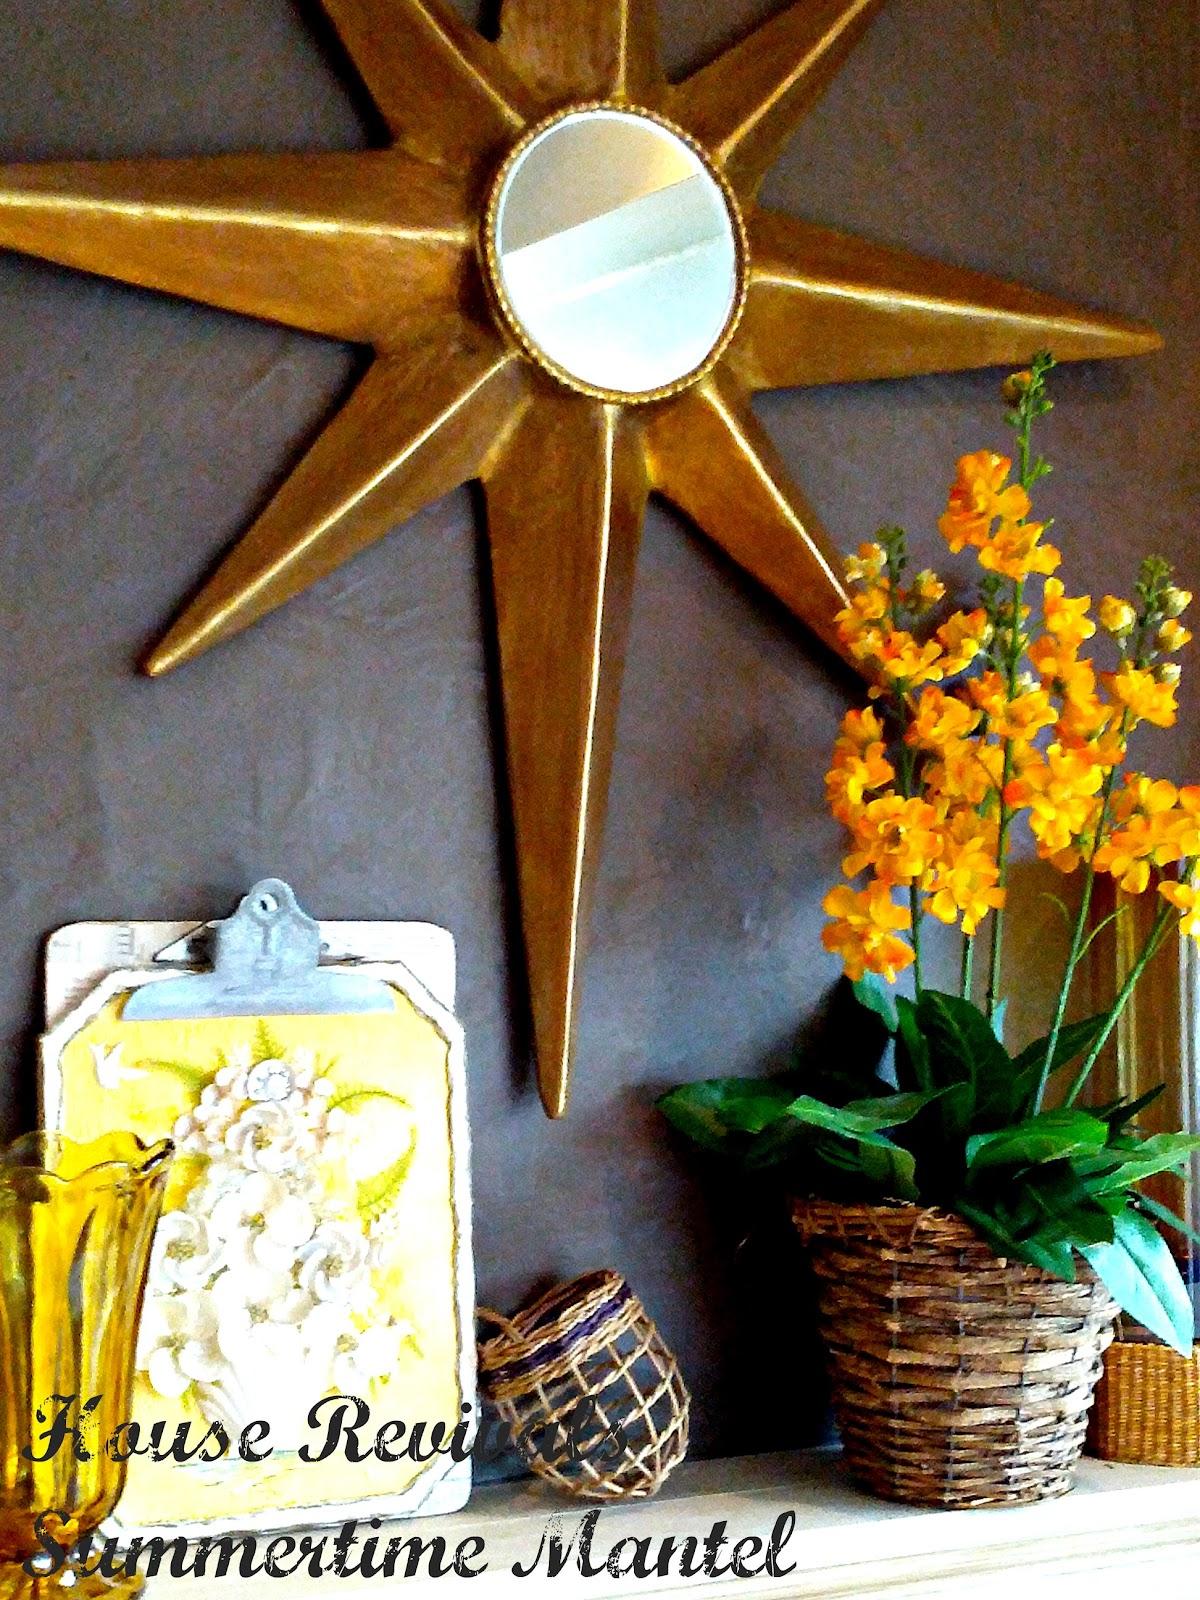 House Revivals How To Make A Paper Mache Star Burst Mirror